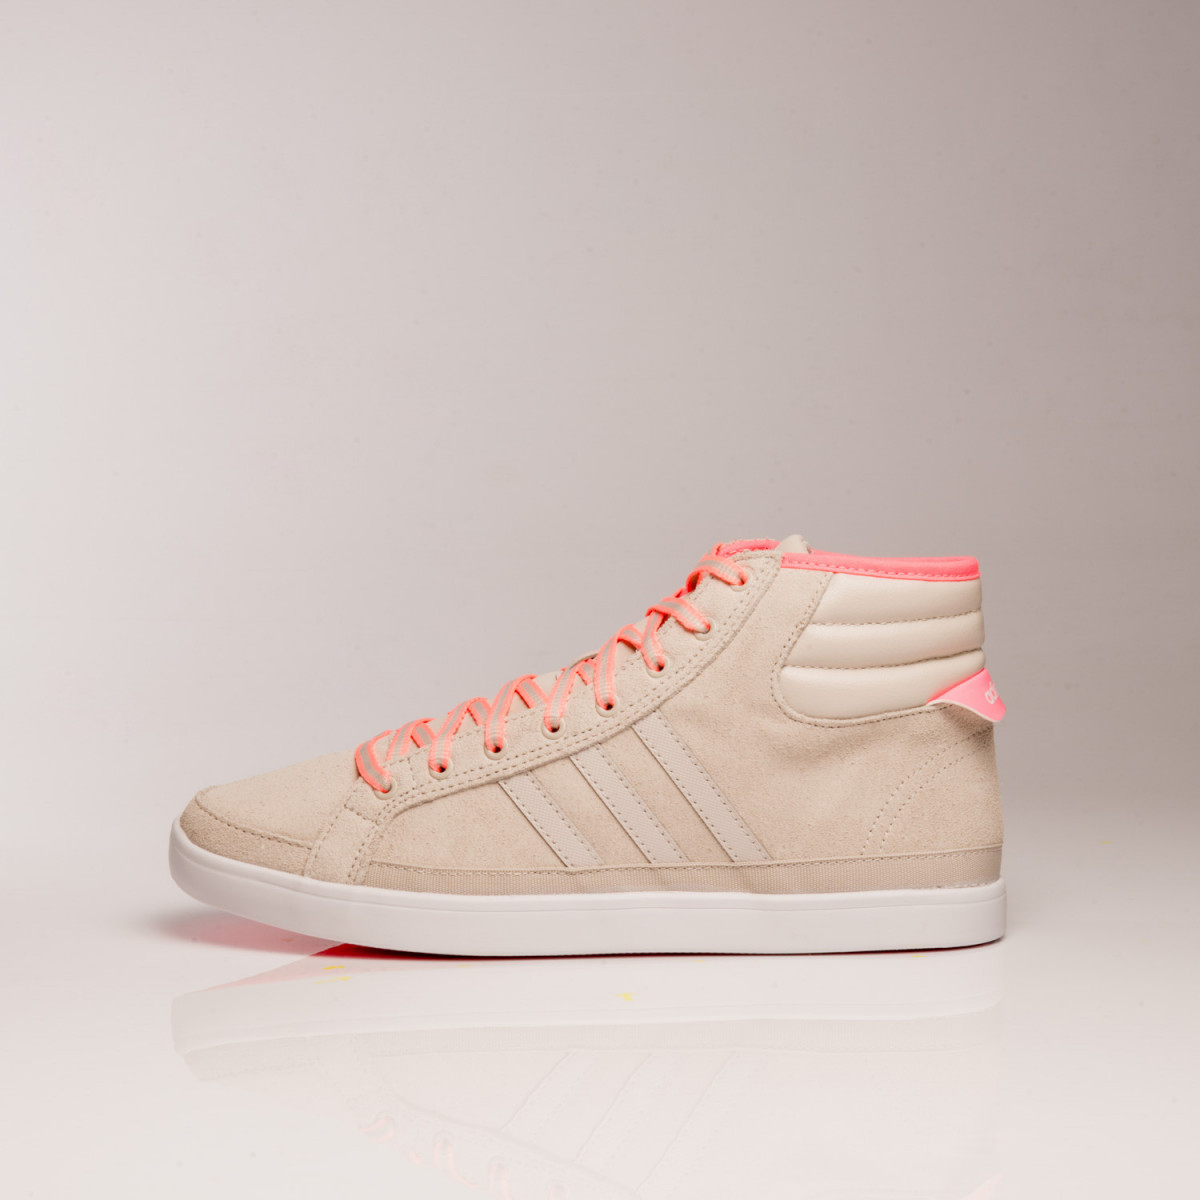 zapatillas botitas adidas mujer 2014